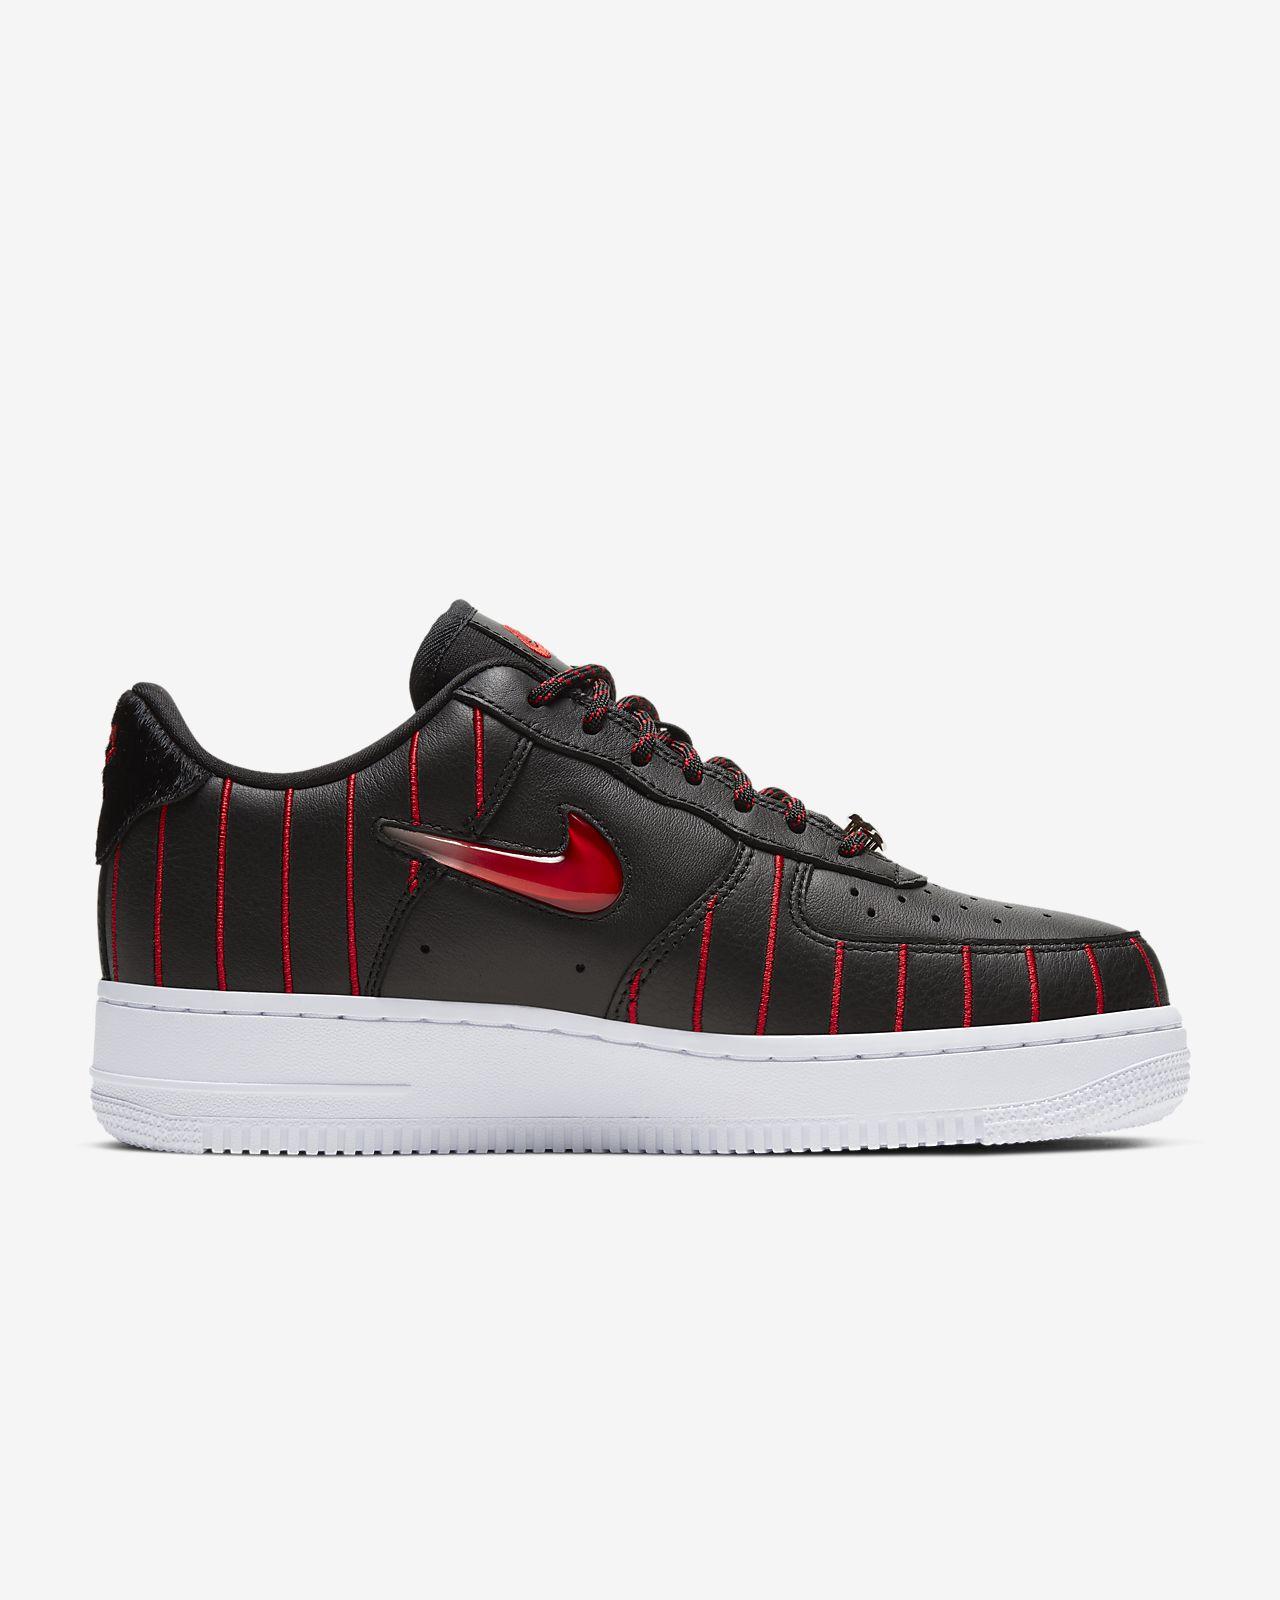 Chaussure Nike Air Force 1 Jewel